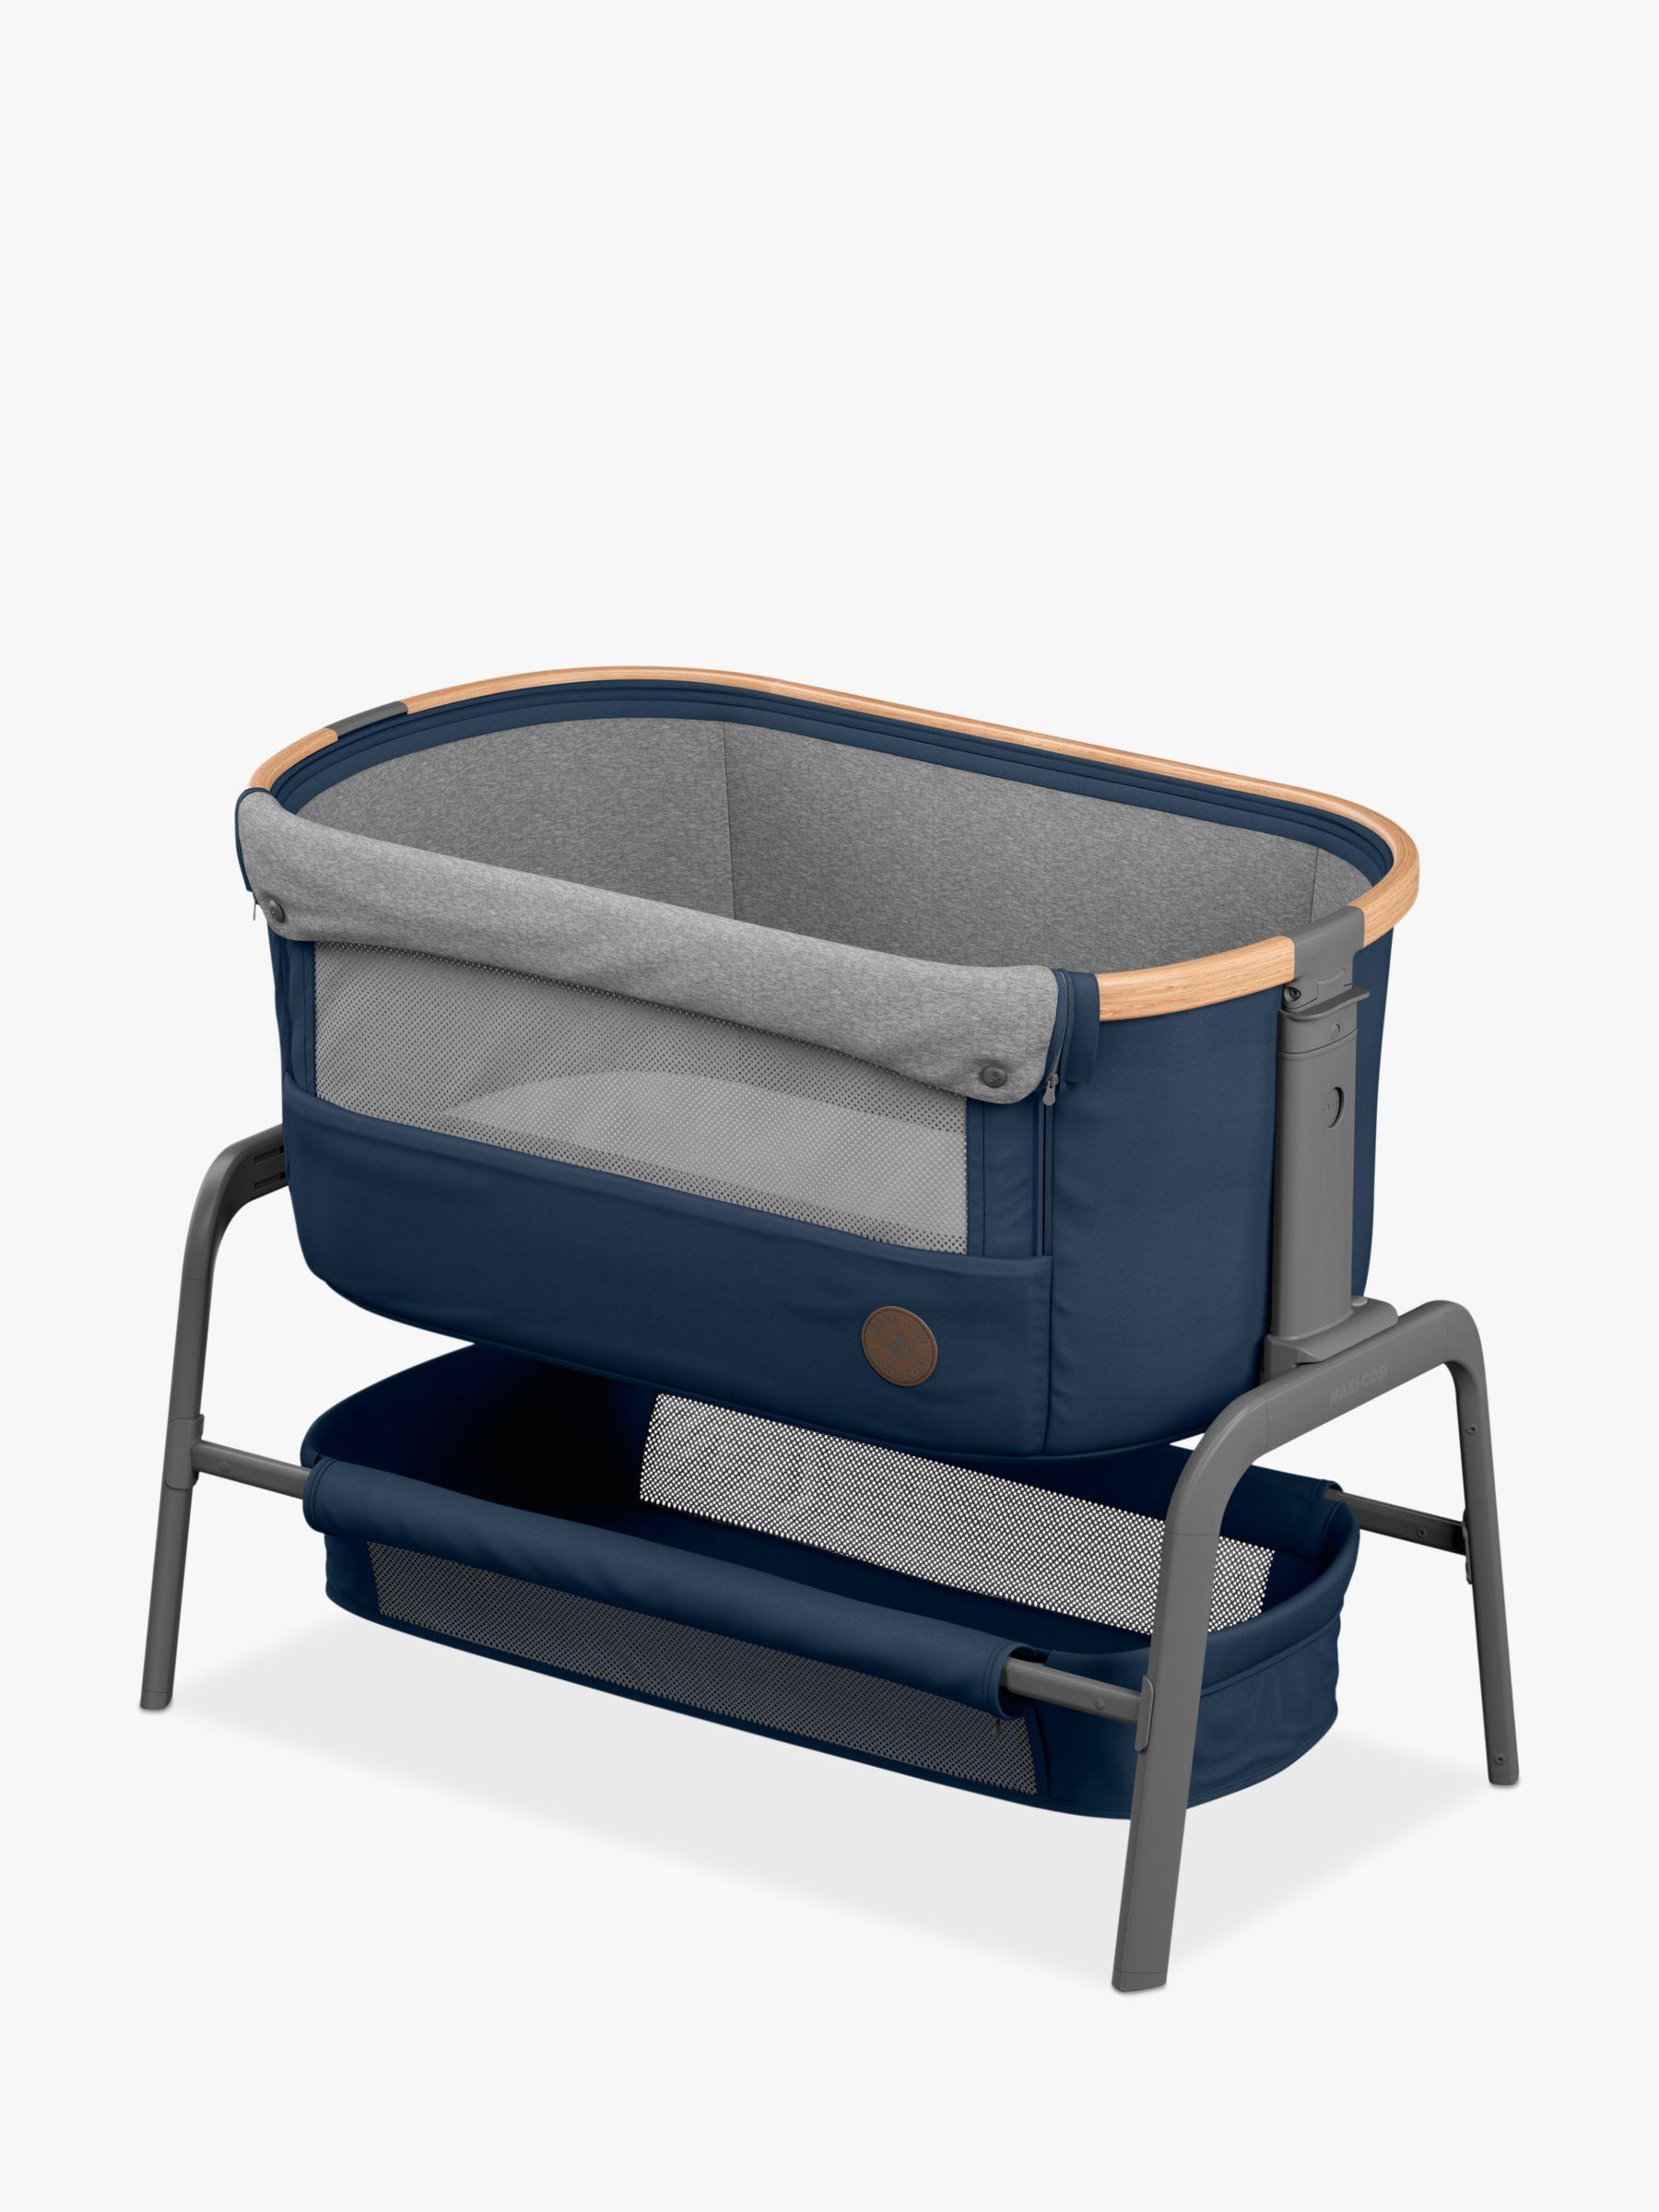 Maxi-Cosi Maxi-Cosi Iora Co-Sleeper Bedside Crib, Essential Blue